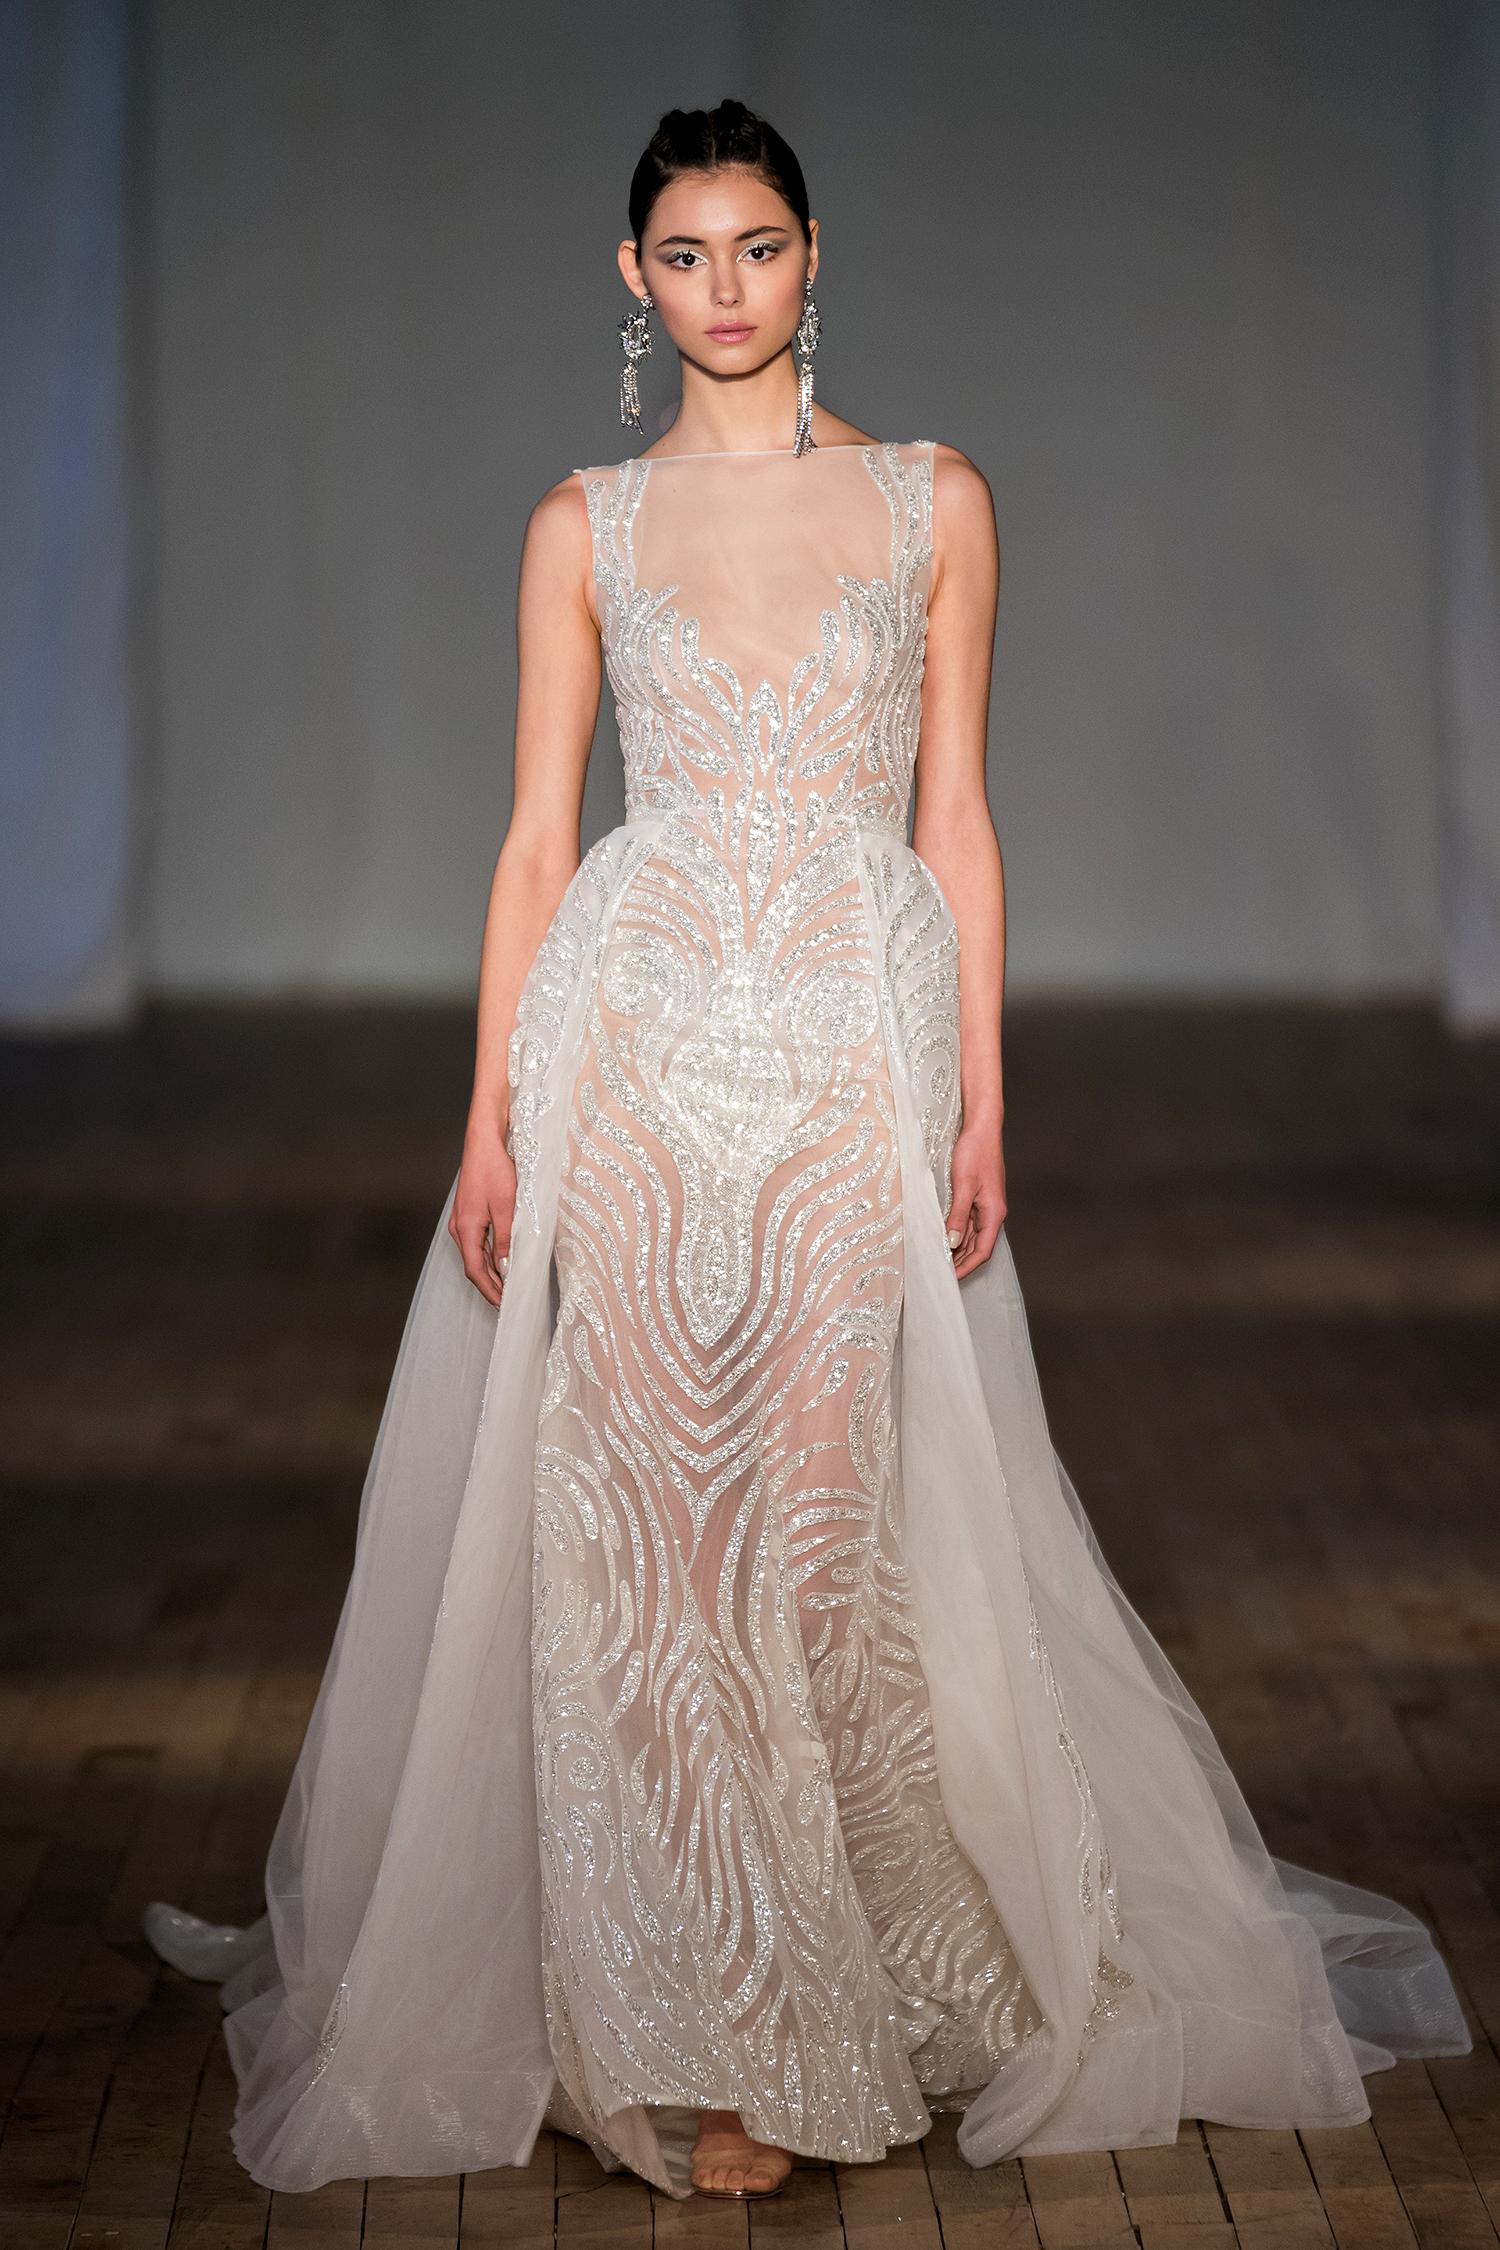 Berta Wedding Dresses.Berta Spring 2019 Wedding Dress Collection Martha Stewart Weddings